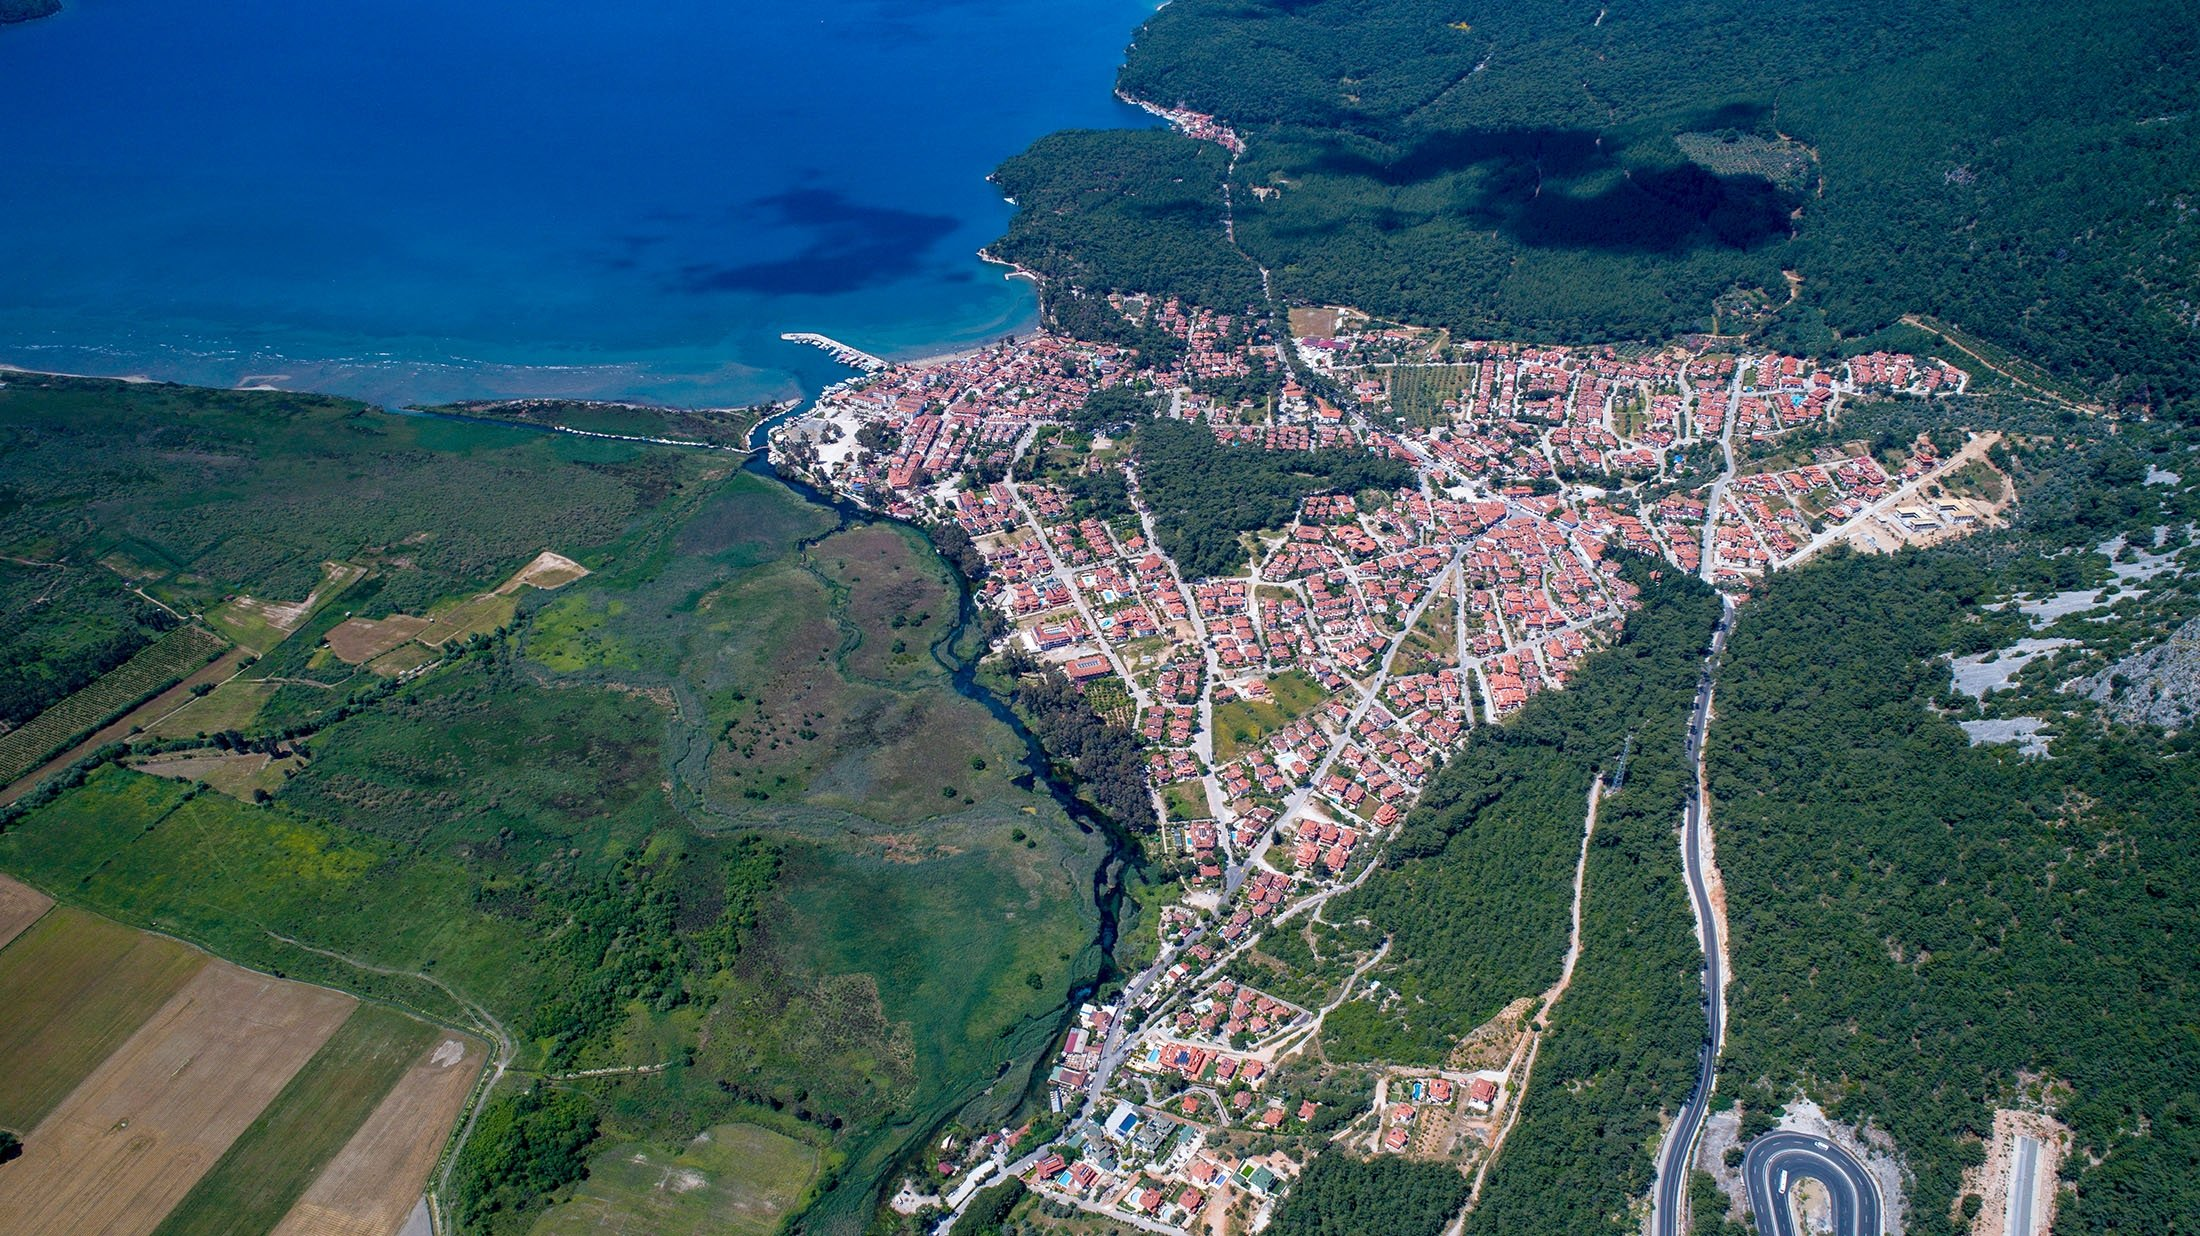 An aerial view of Akyaka in Muğla. (Shutterstock Photo)